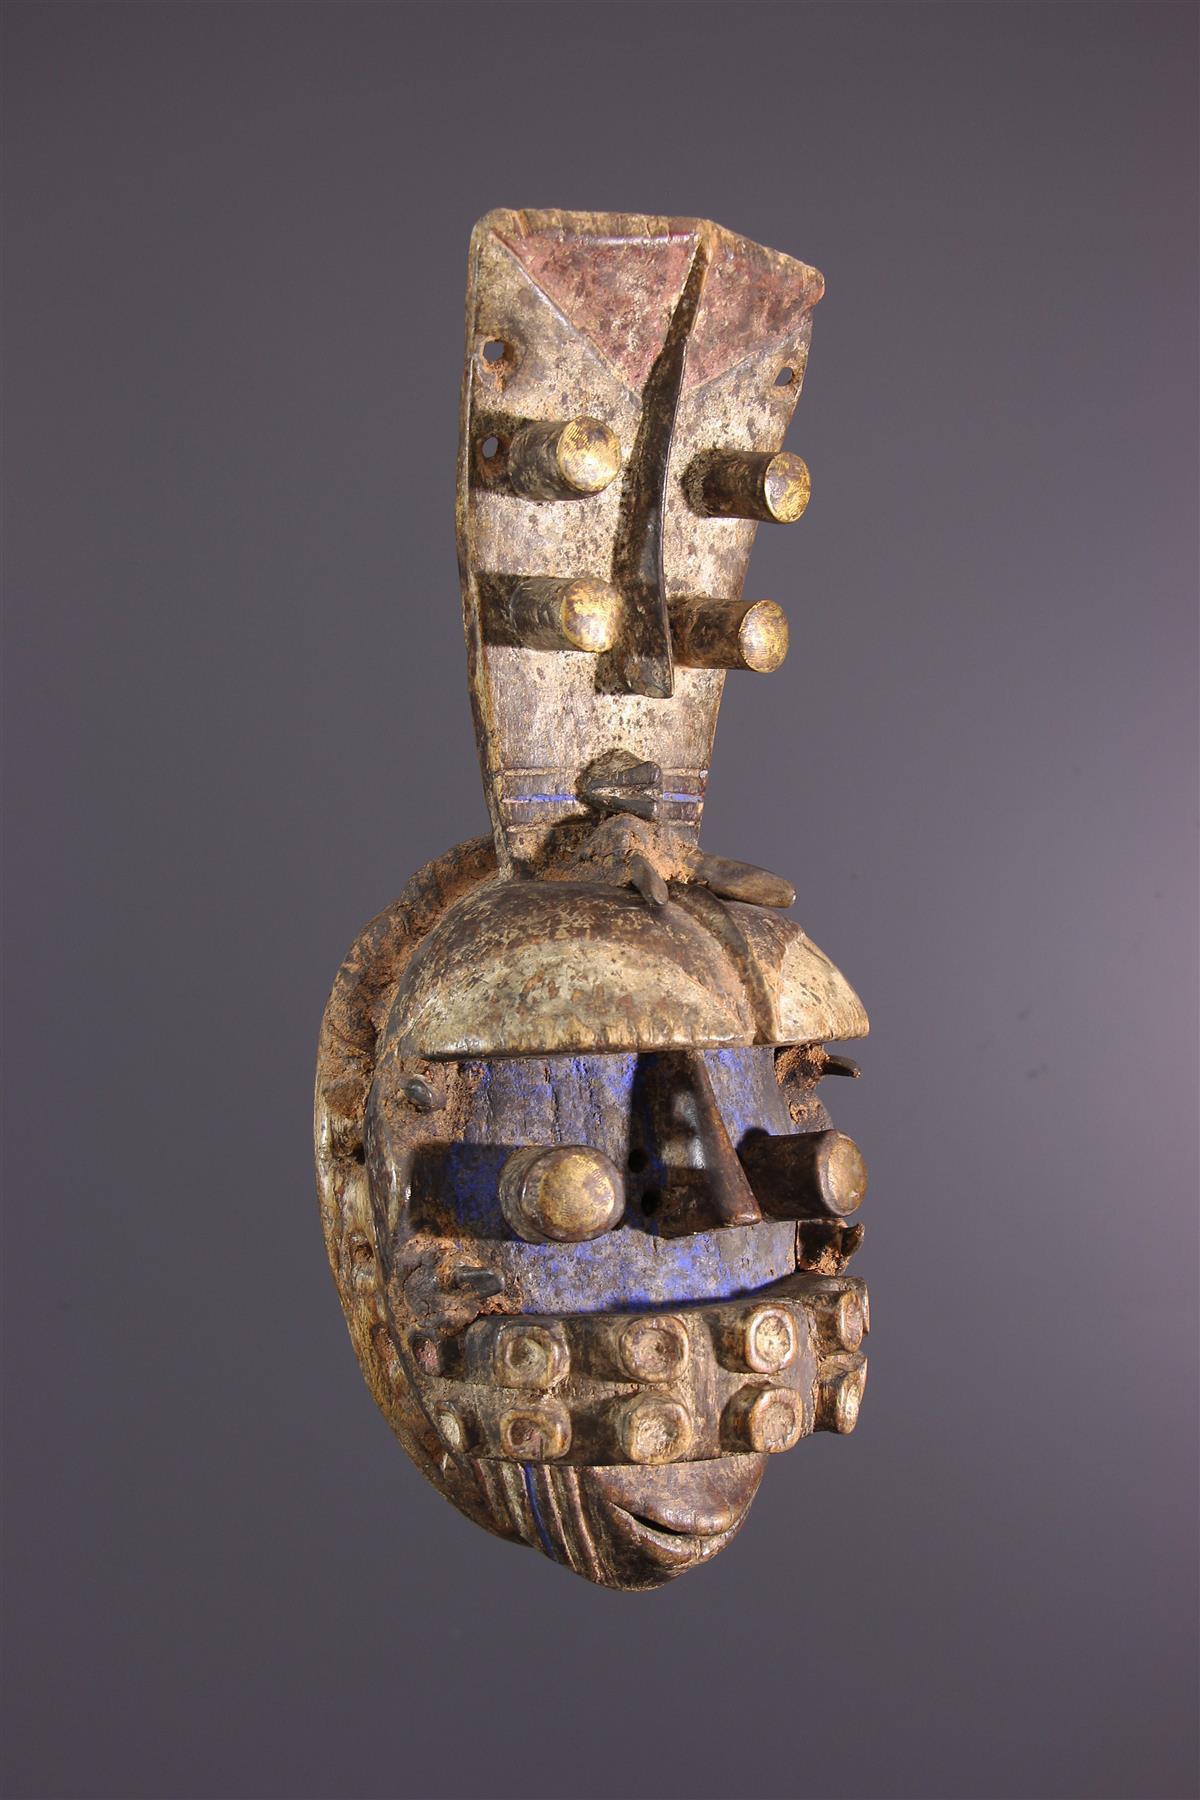 Masque Grebo - Tribal art